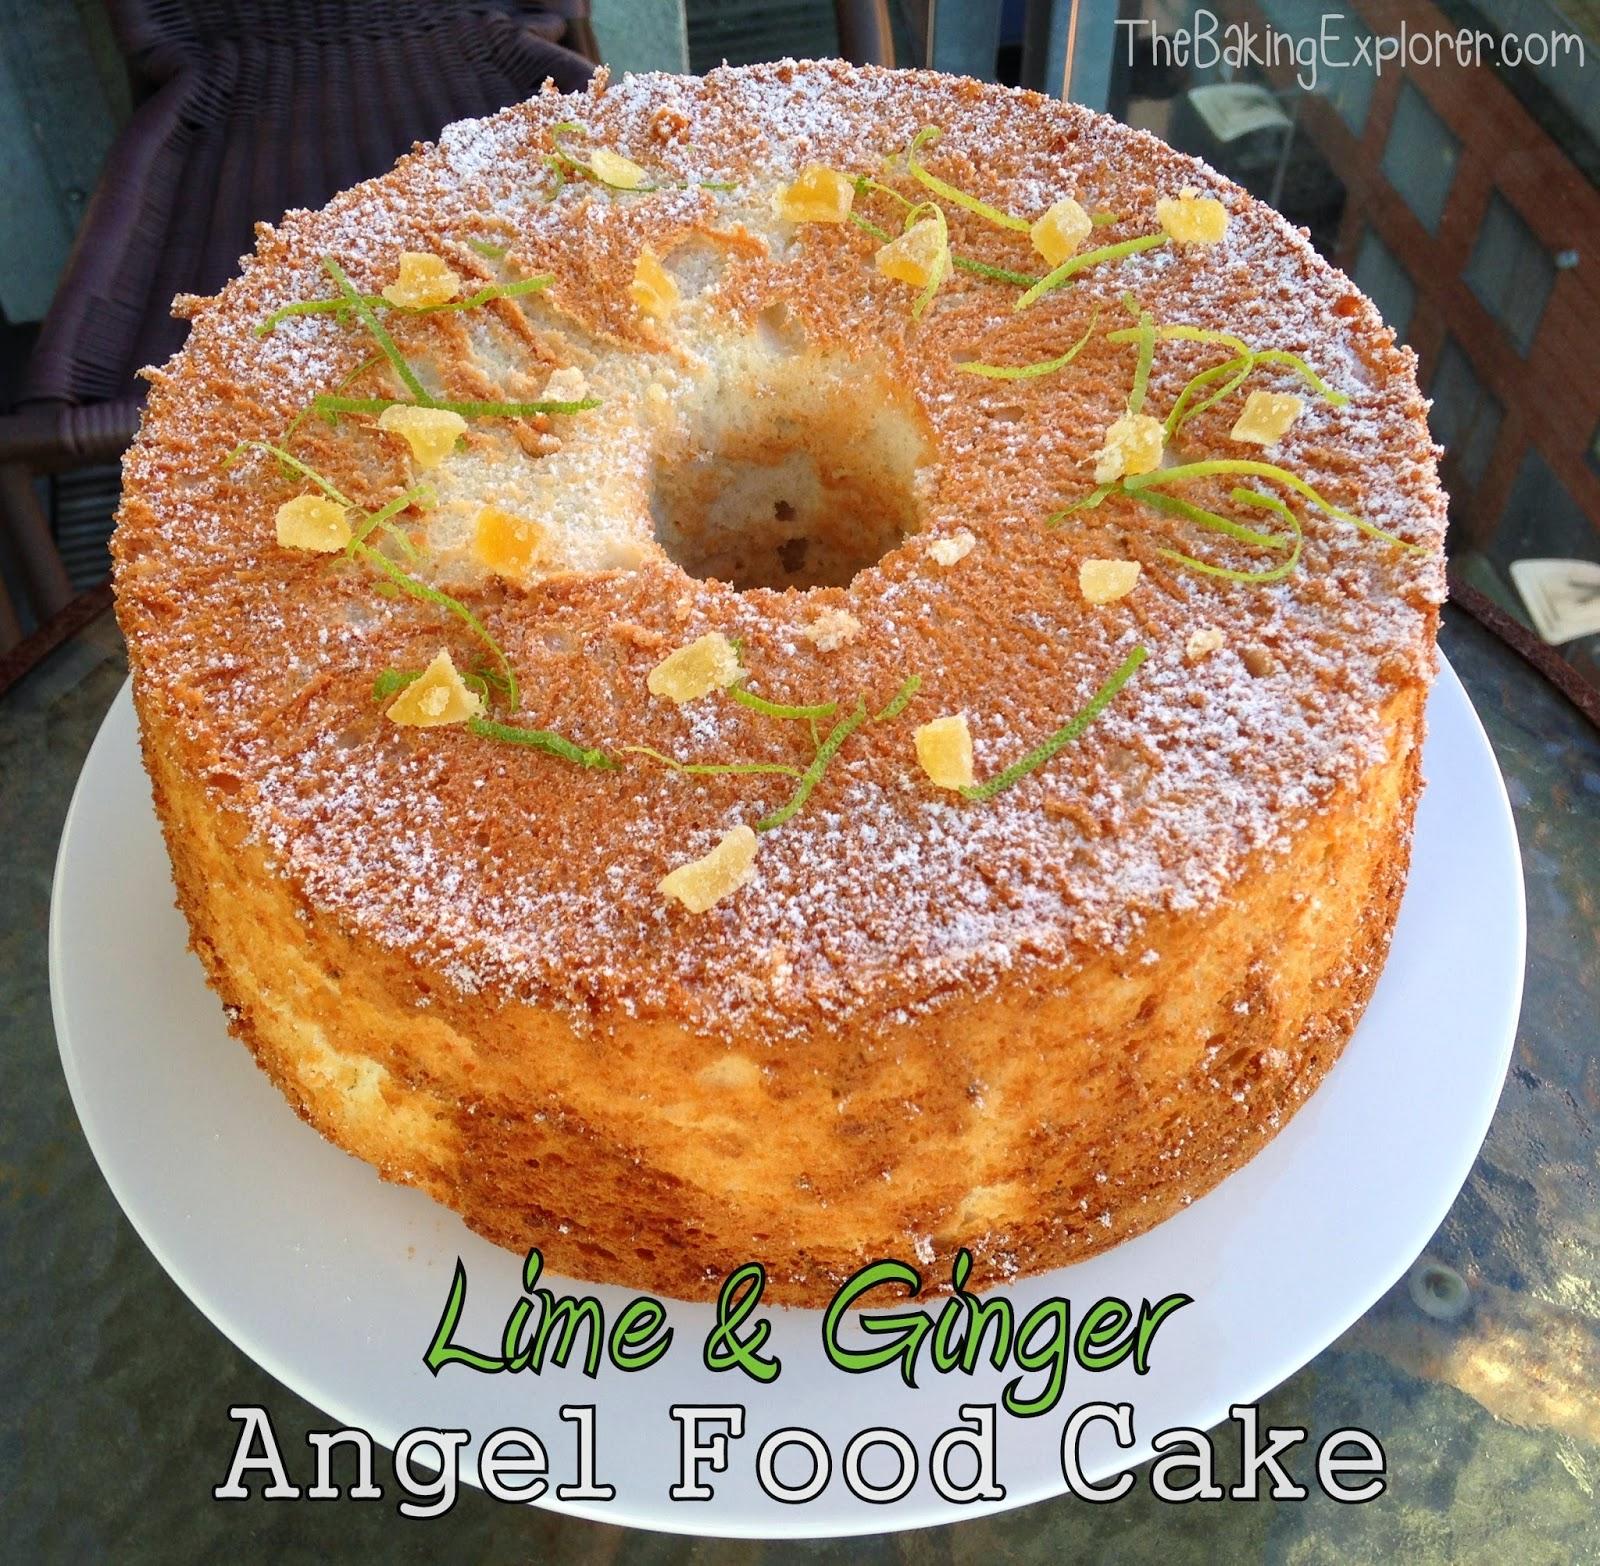 The Baking Explorer: Lime & Ginger Angel Food Cake